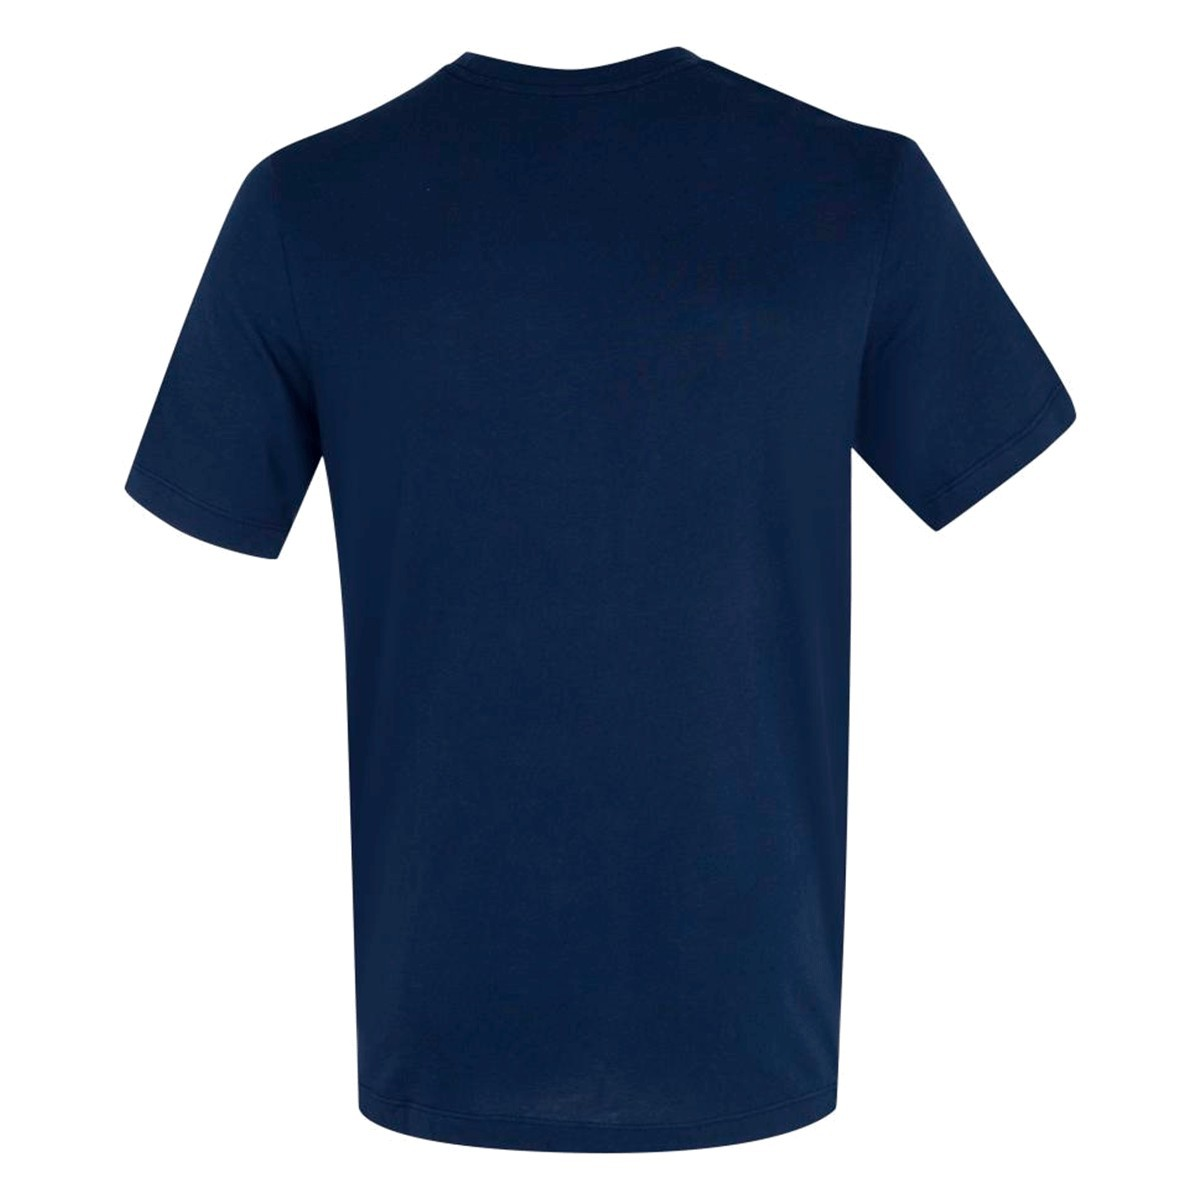 Camiseta Nike Court EMB Tee Masculino Azul